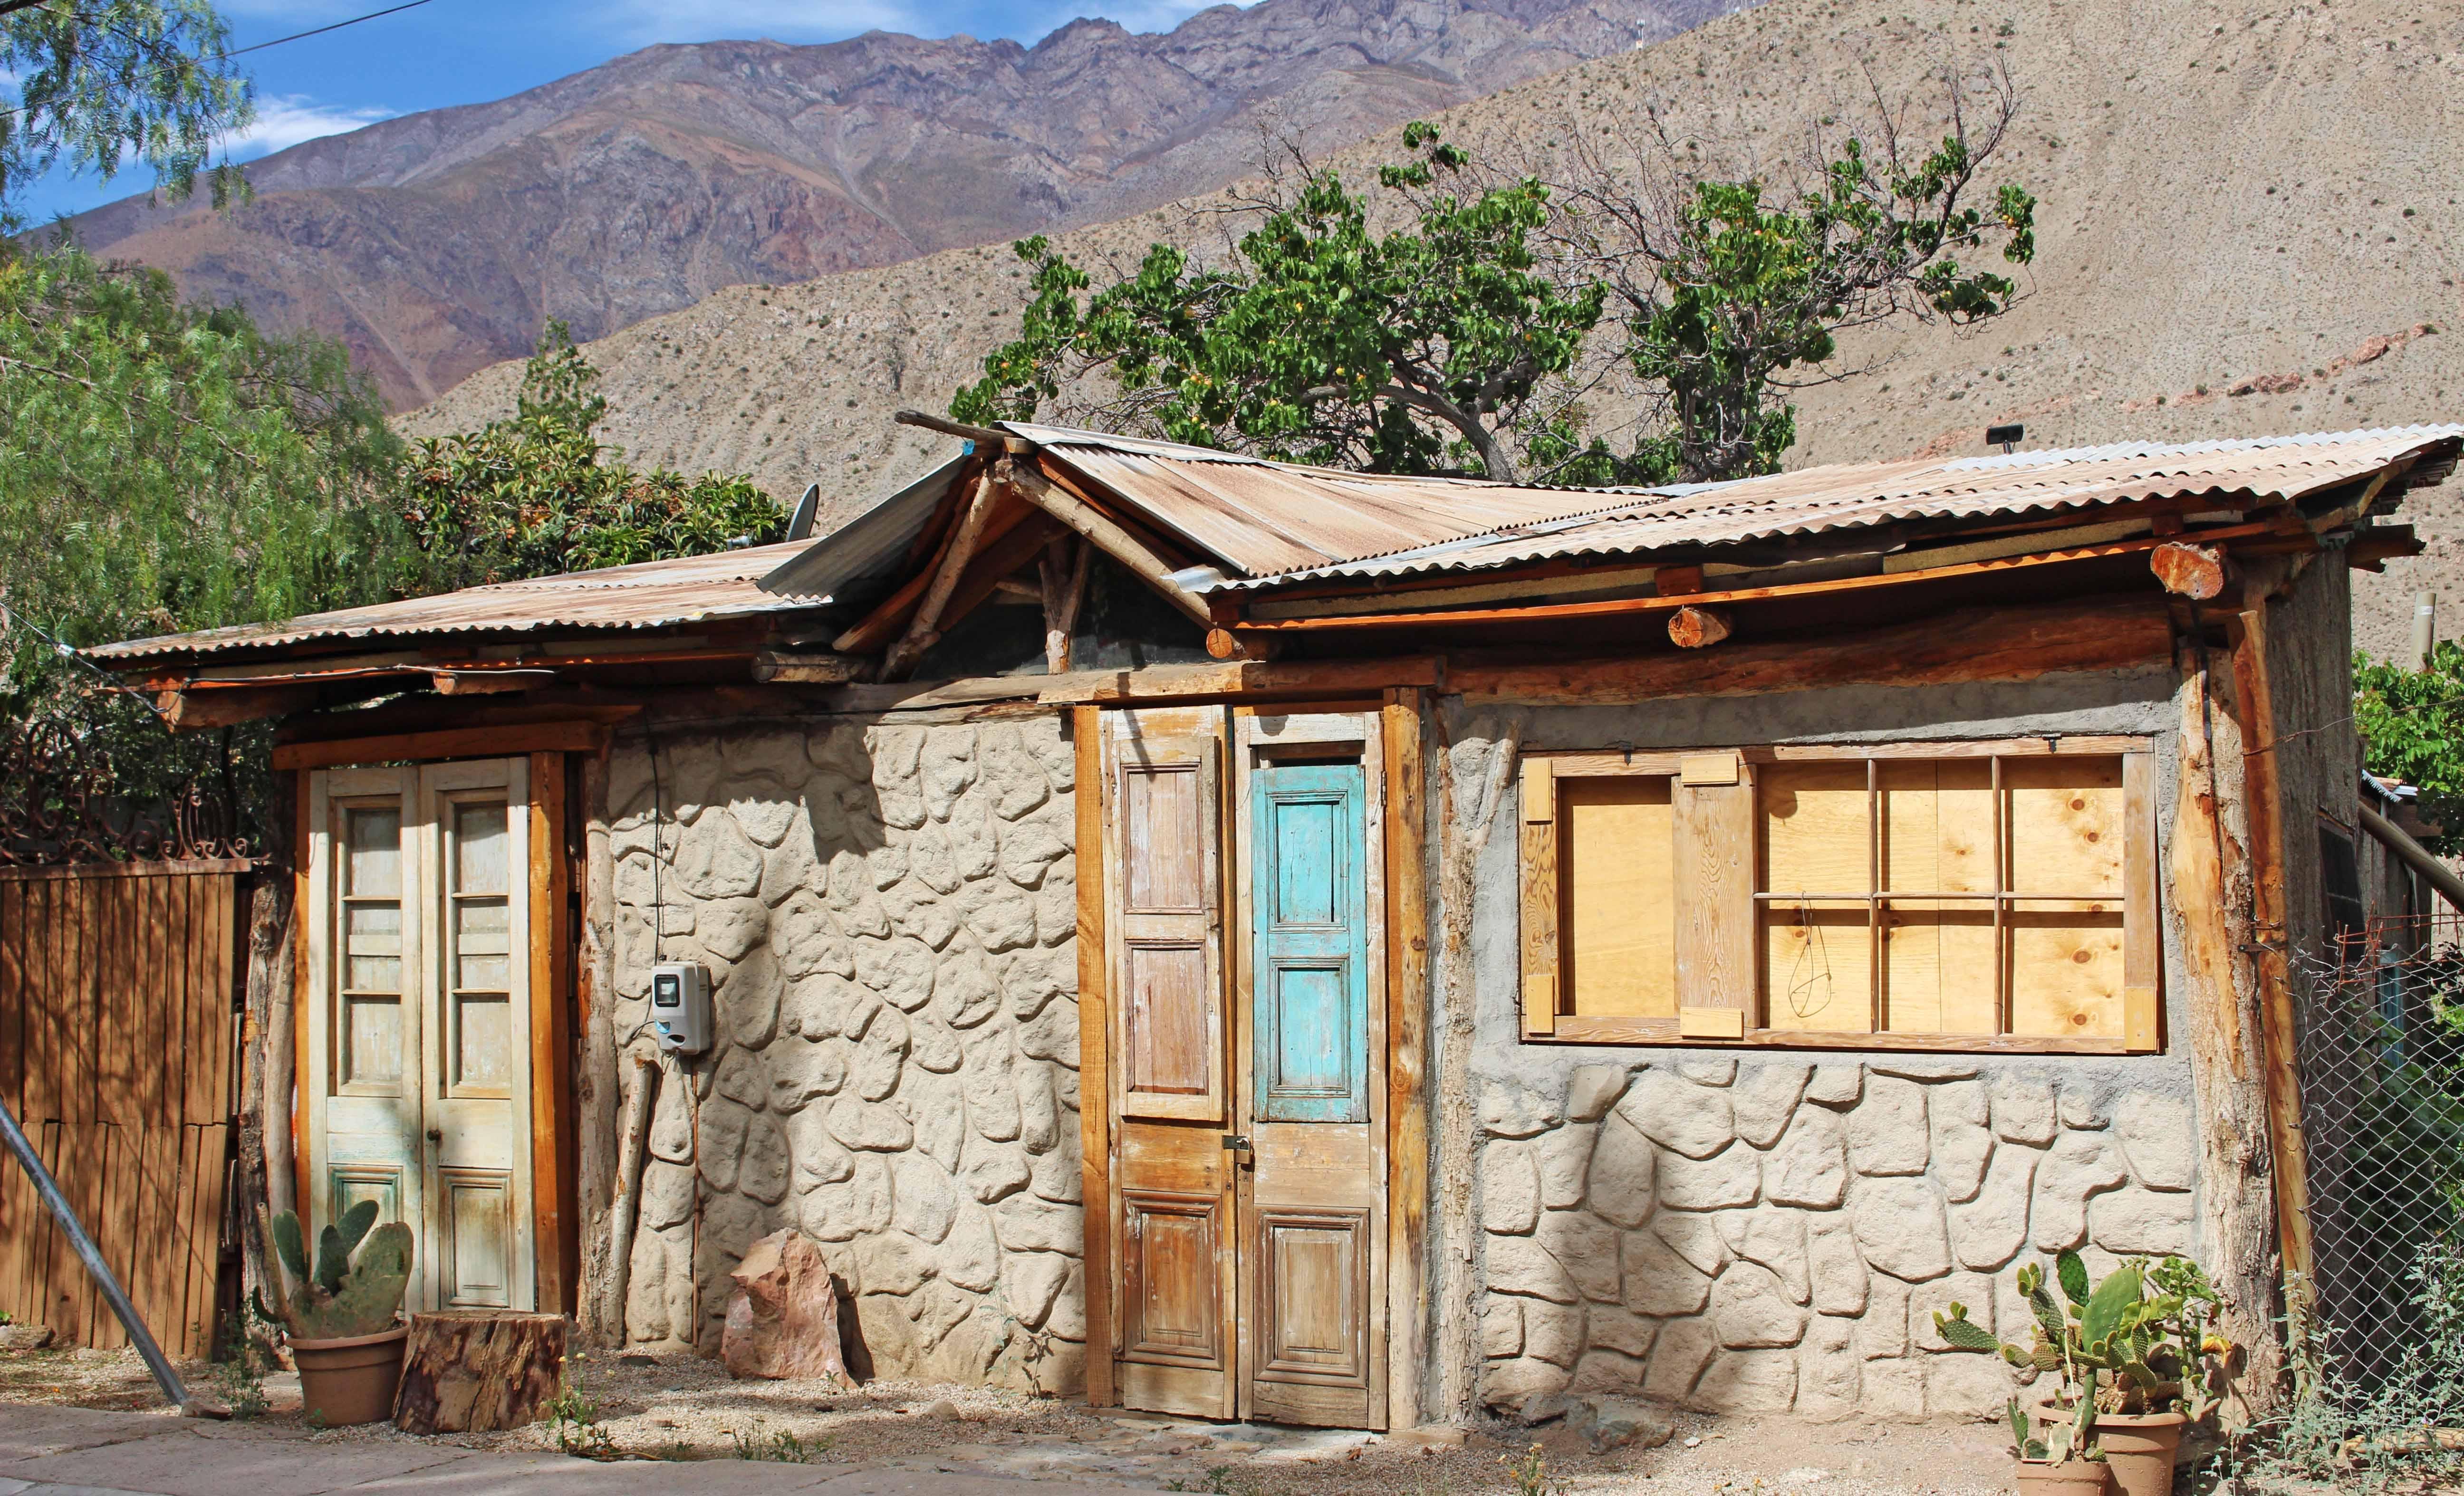 Cabin, Elqui Valley, Inca to Inuit